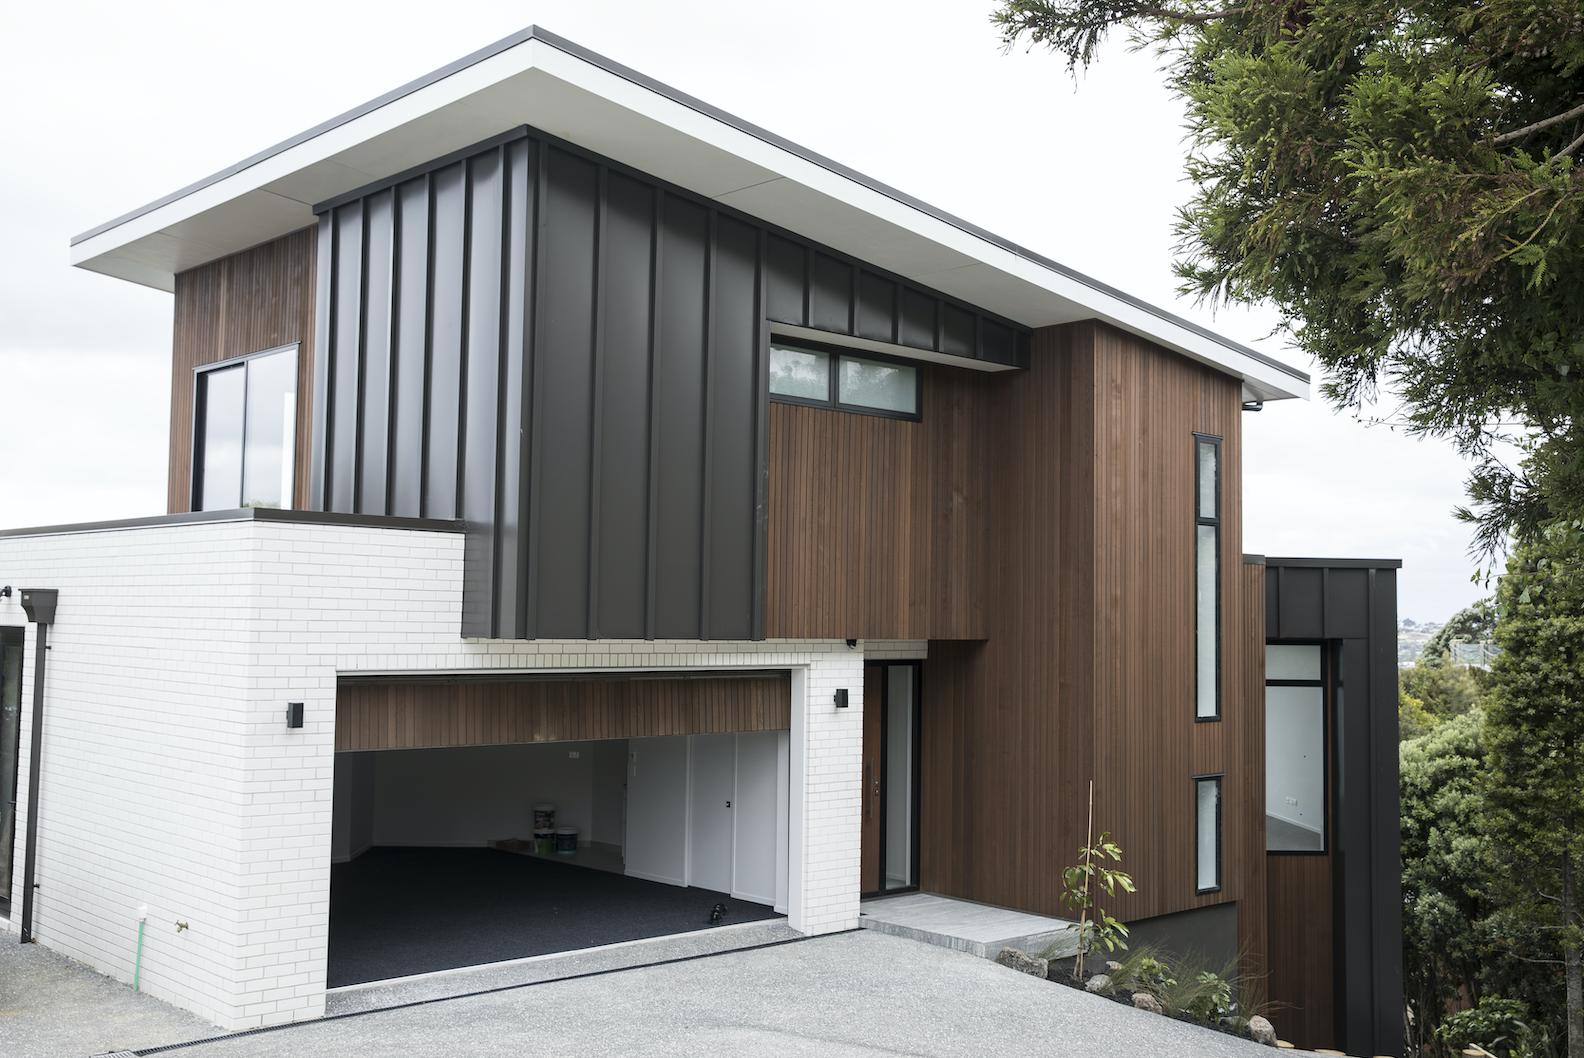 The-Roofing-Store-Steel-Metal-Standing-Seam-Batten-Cap-Virtor+-ZX-Ironsand-5-LR.png